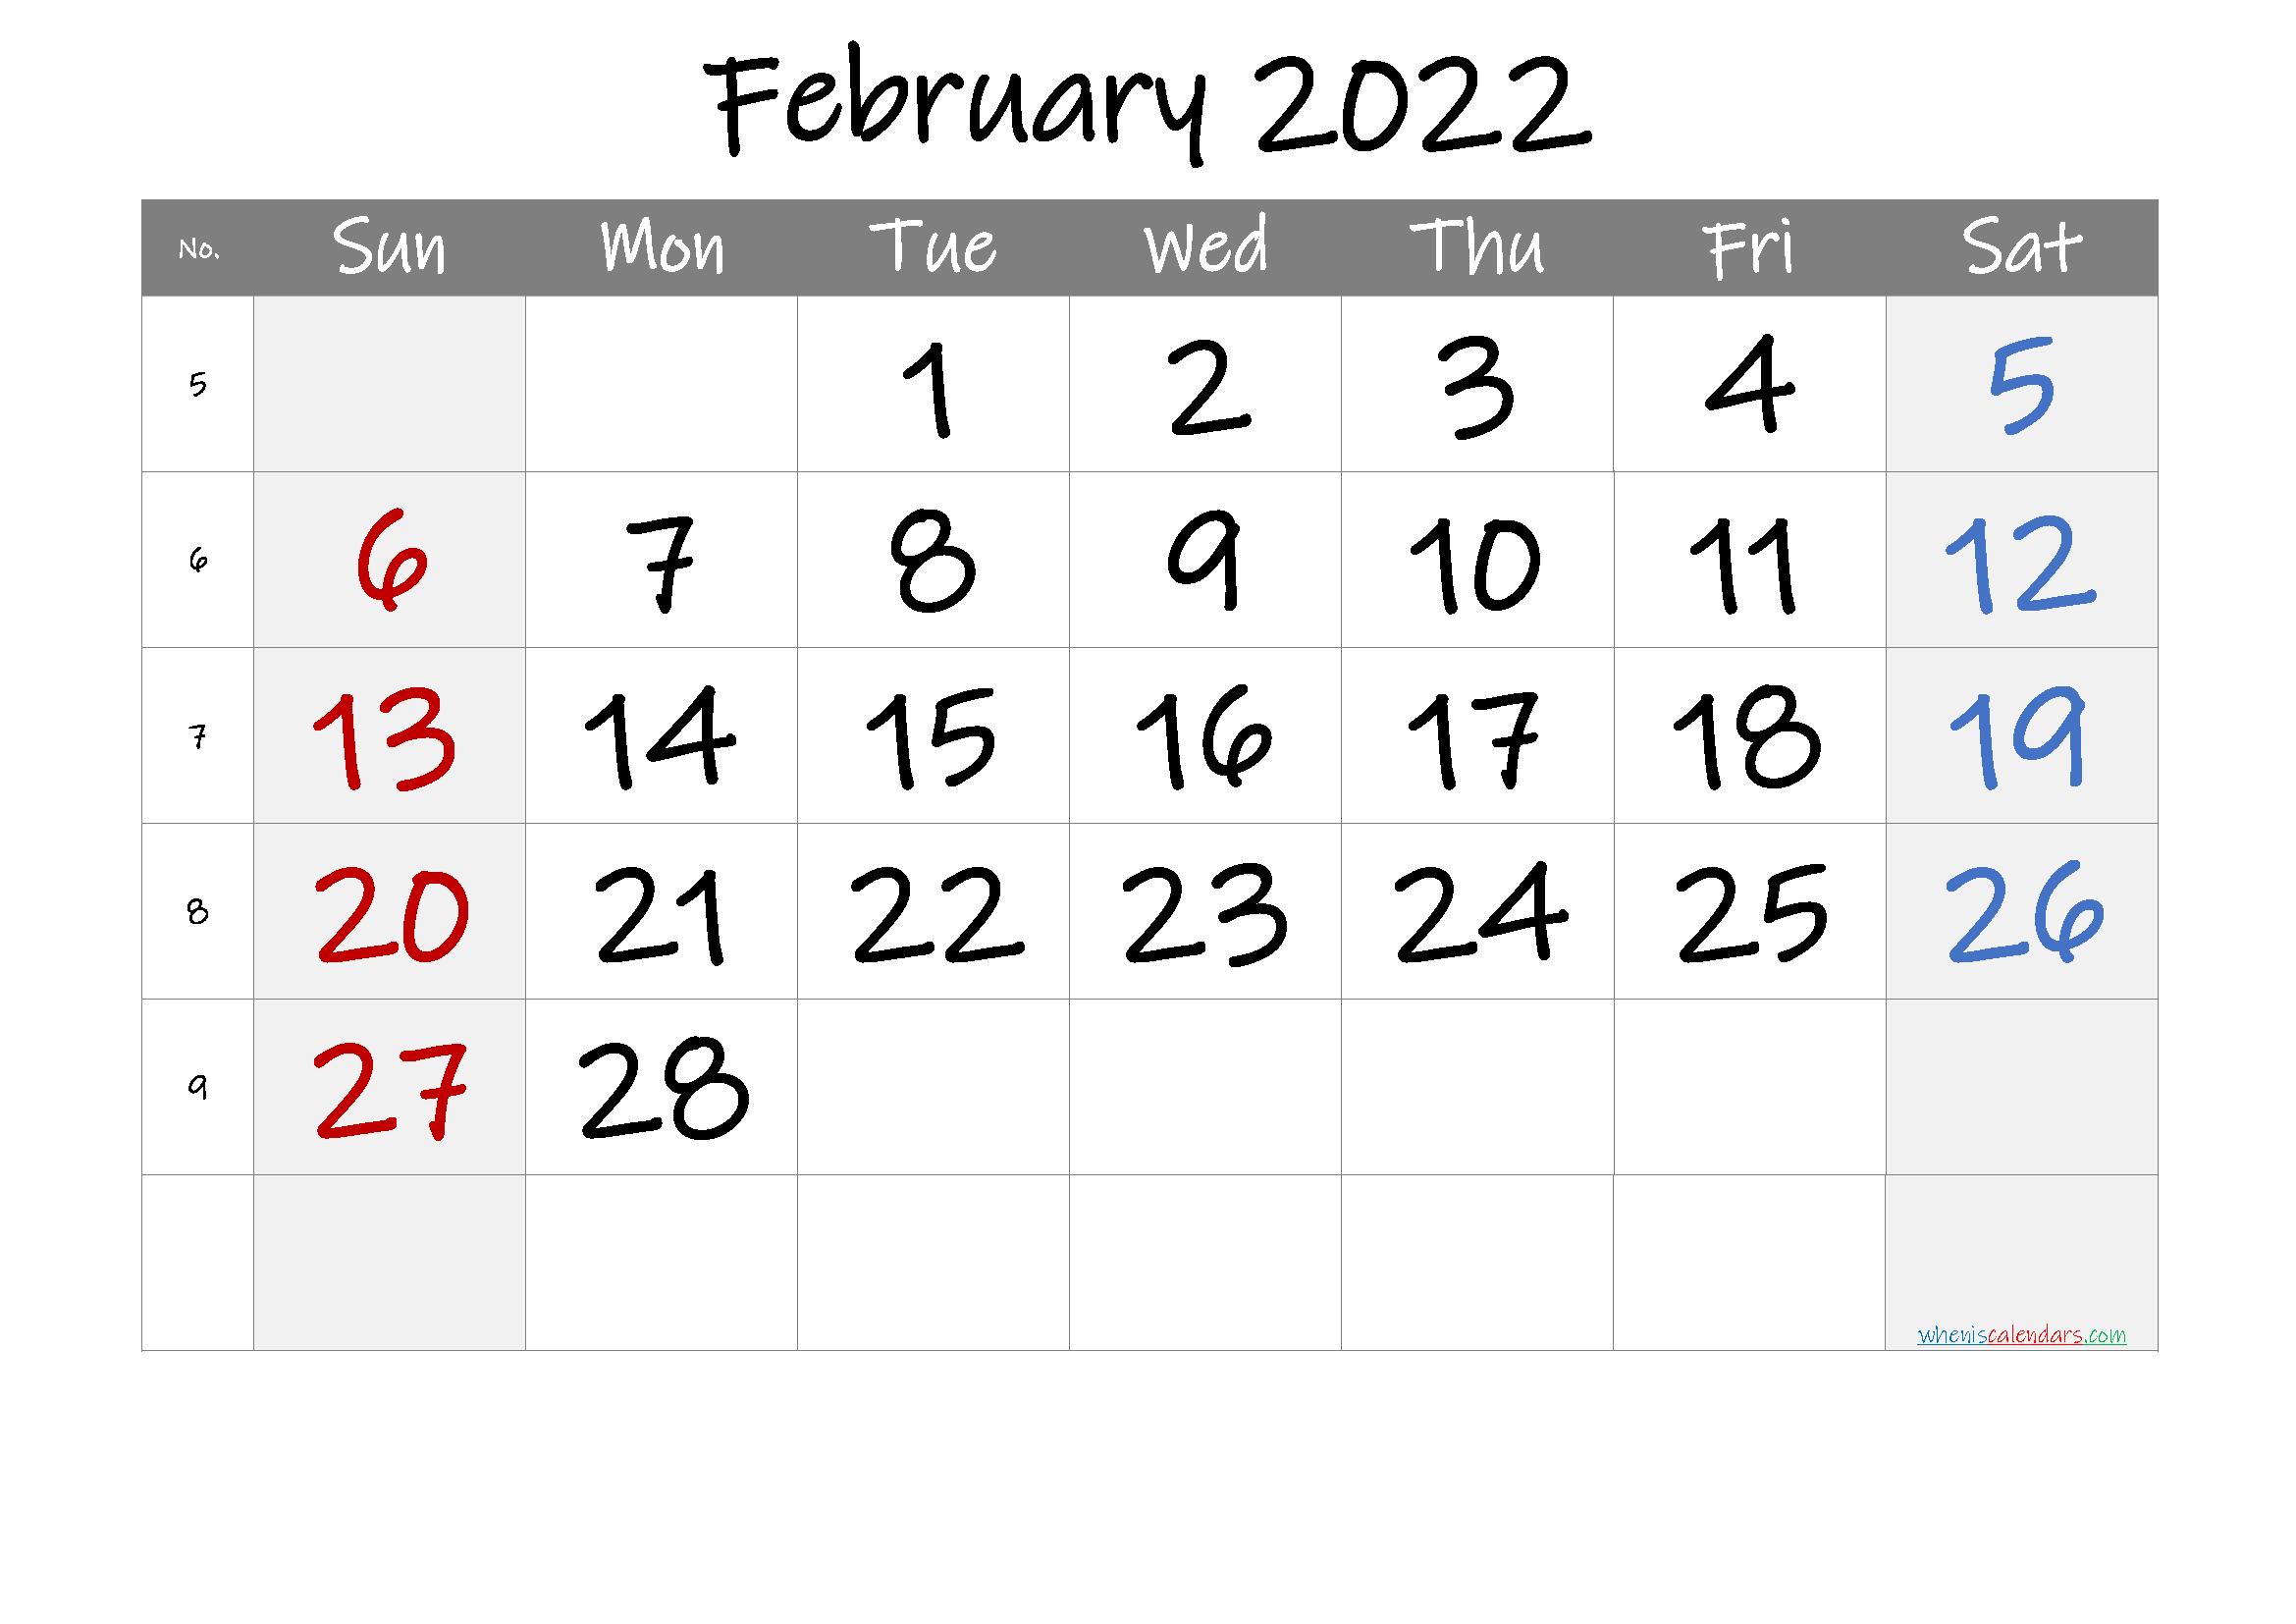 Free Printable 2022 February Calendar With Free Printable Calendar For February 2022